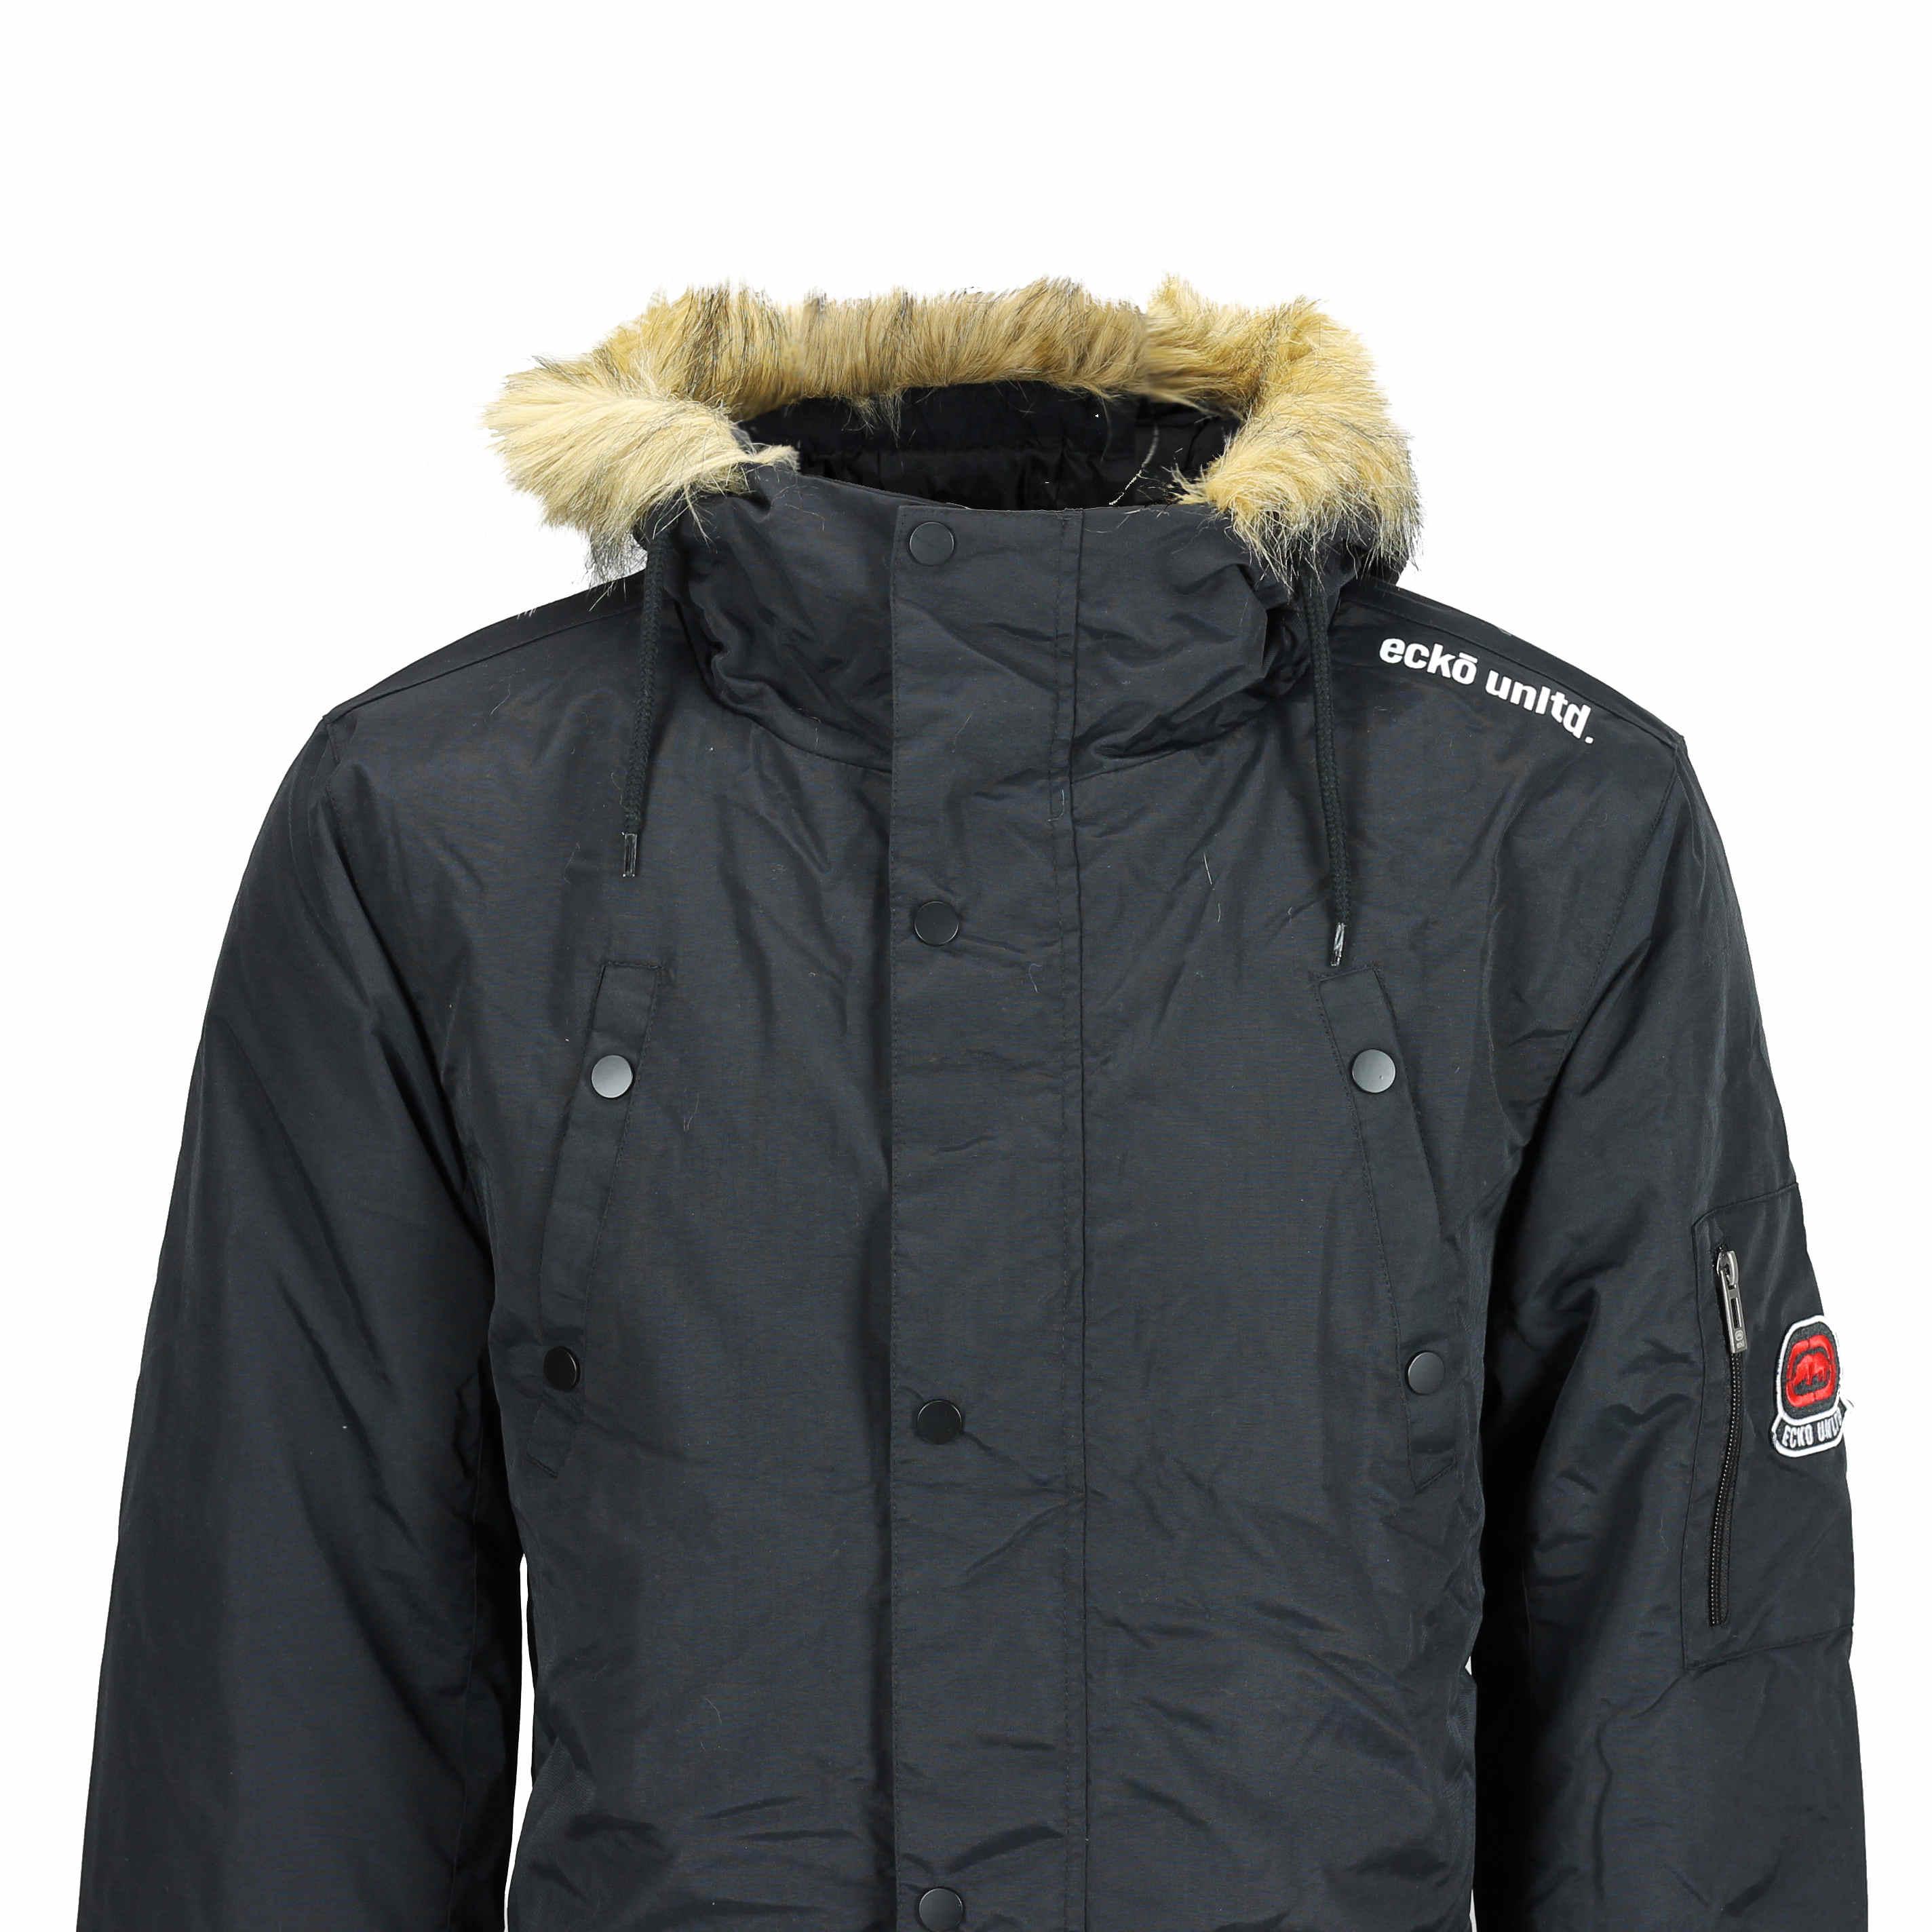 Black parka jacket with hood